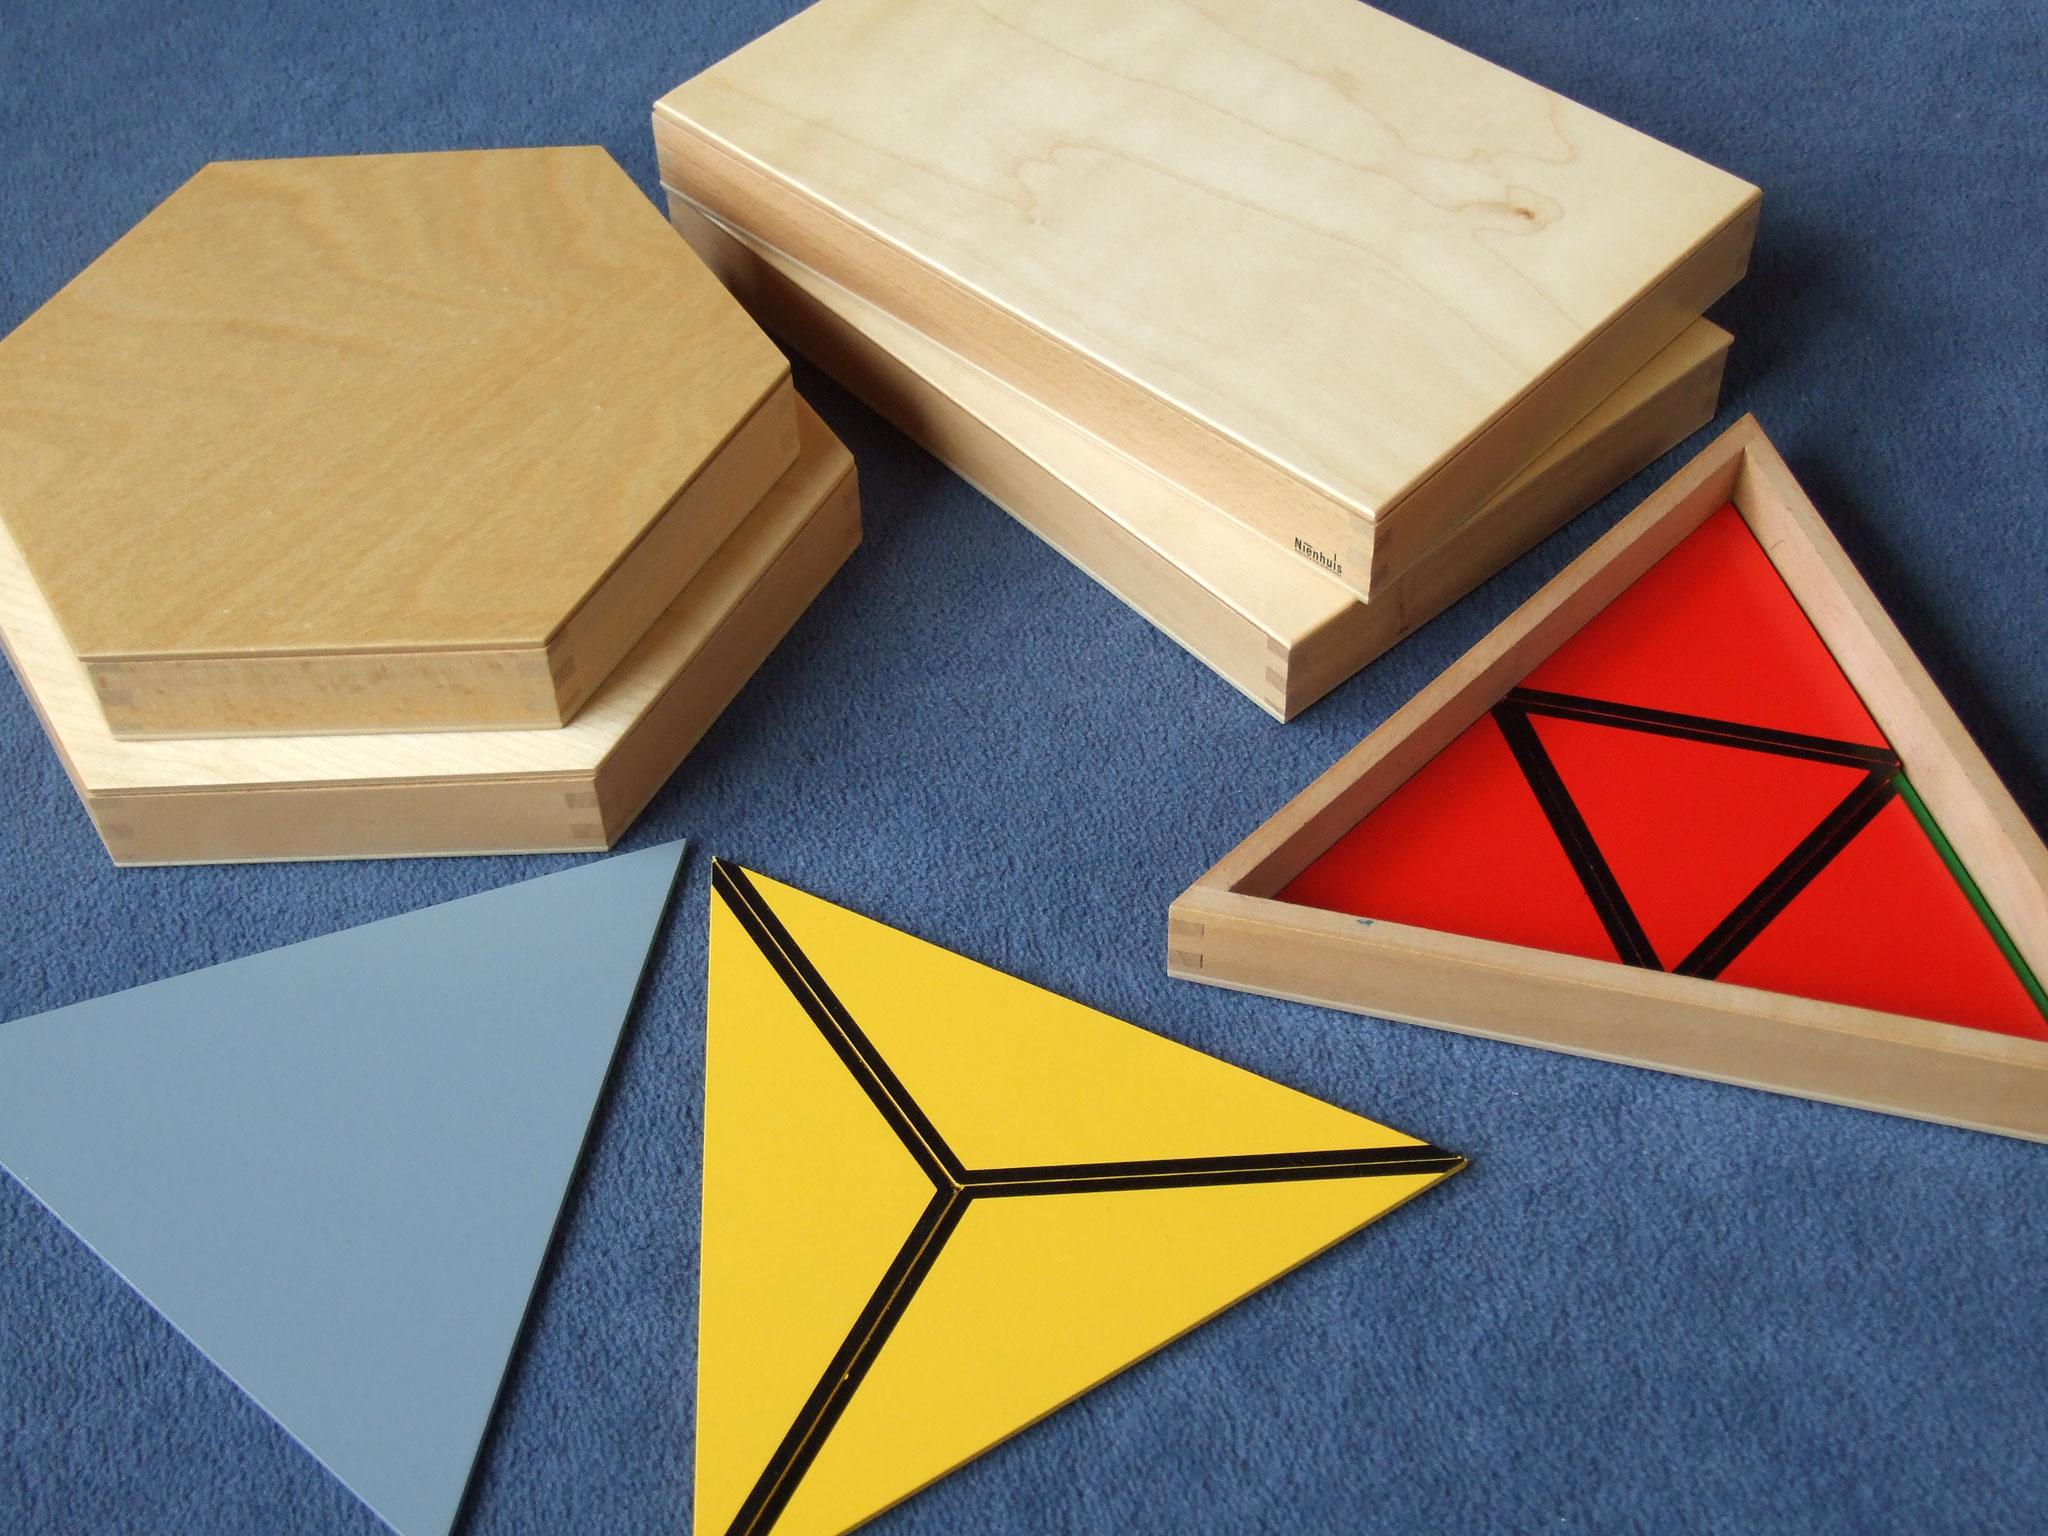 Konstruktive Dreiecke, komplett (5 Kästen mit verschiedenen  Dreiecken)